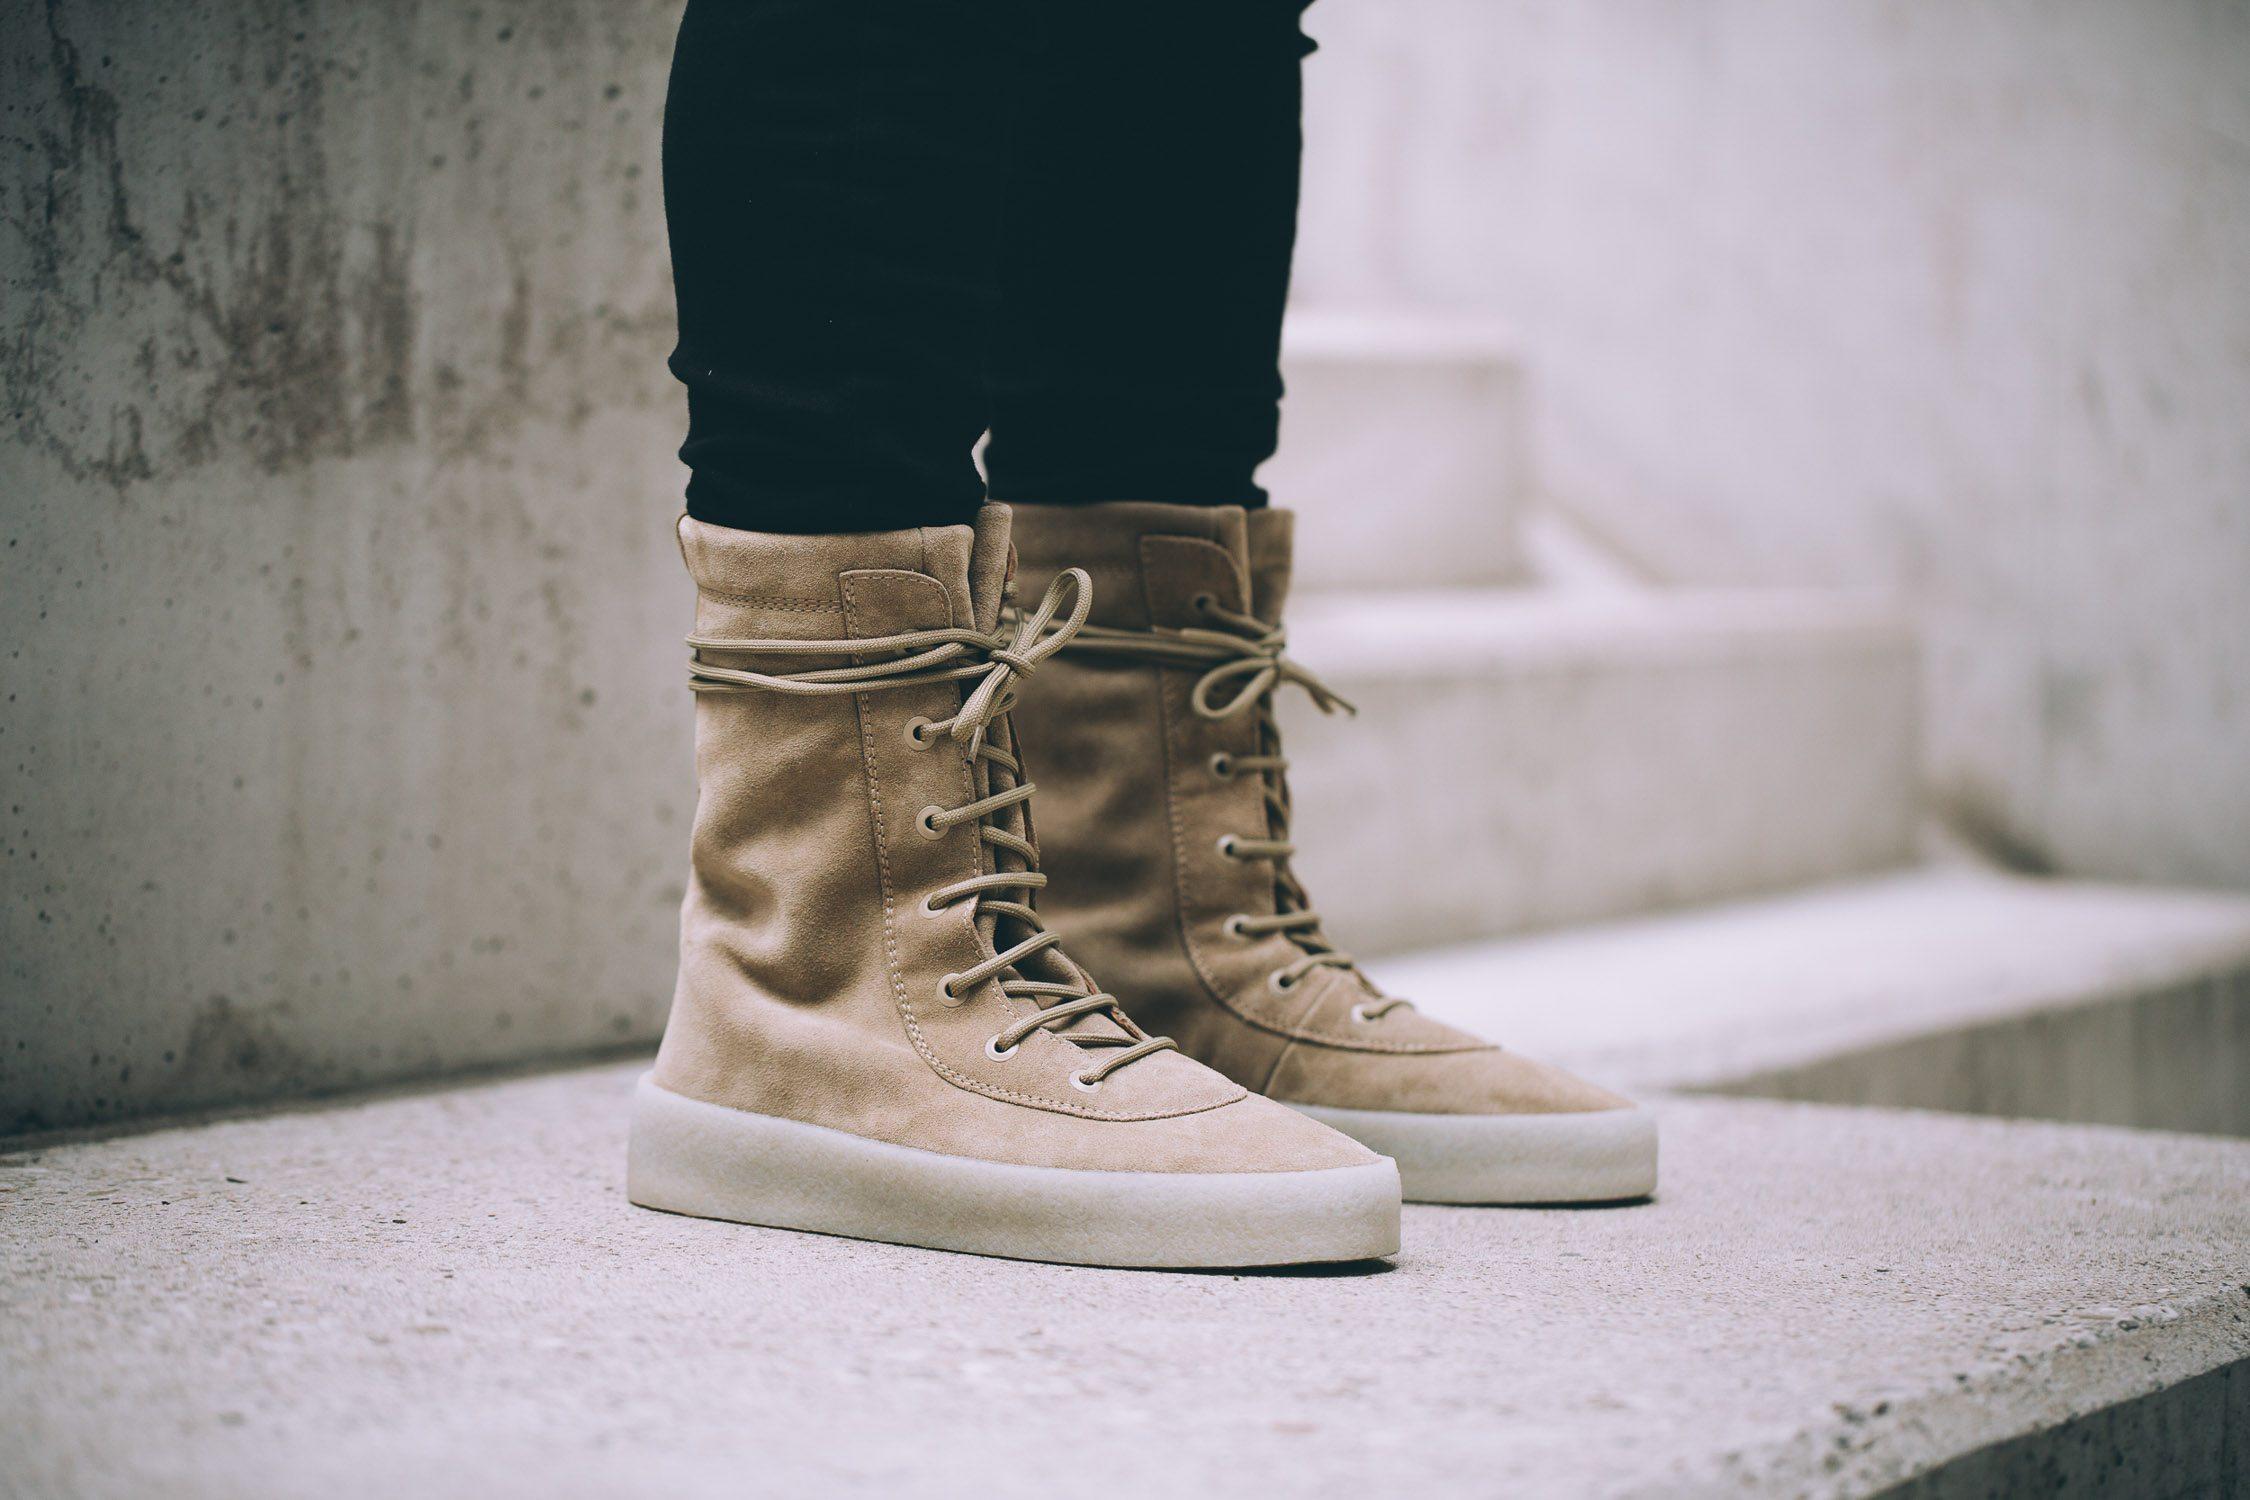 adidas Originals x Kanye West Crepe Boot 11